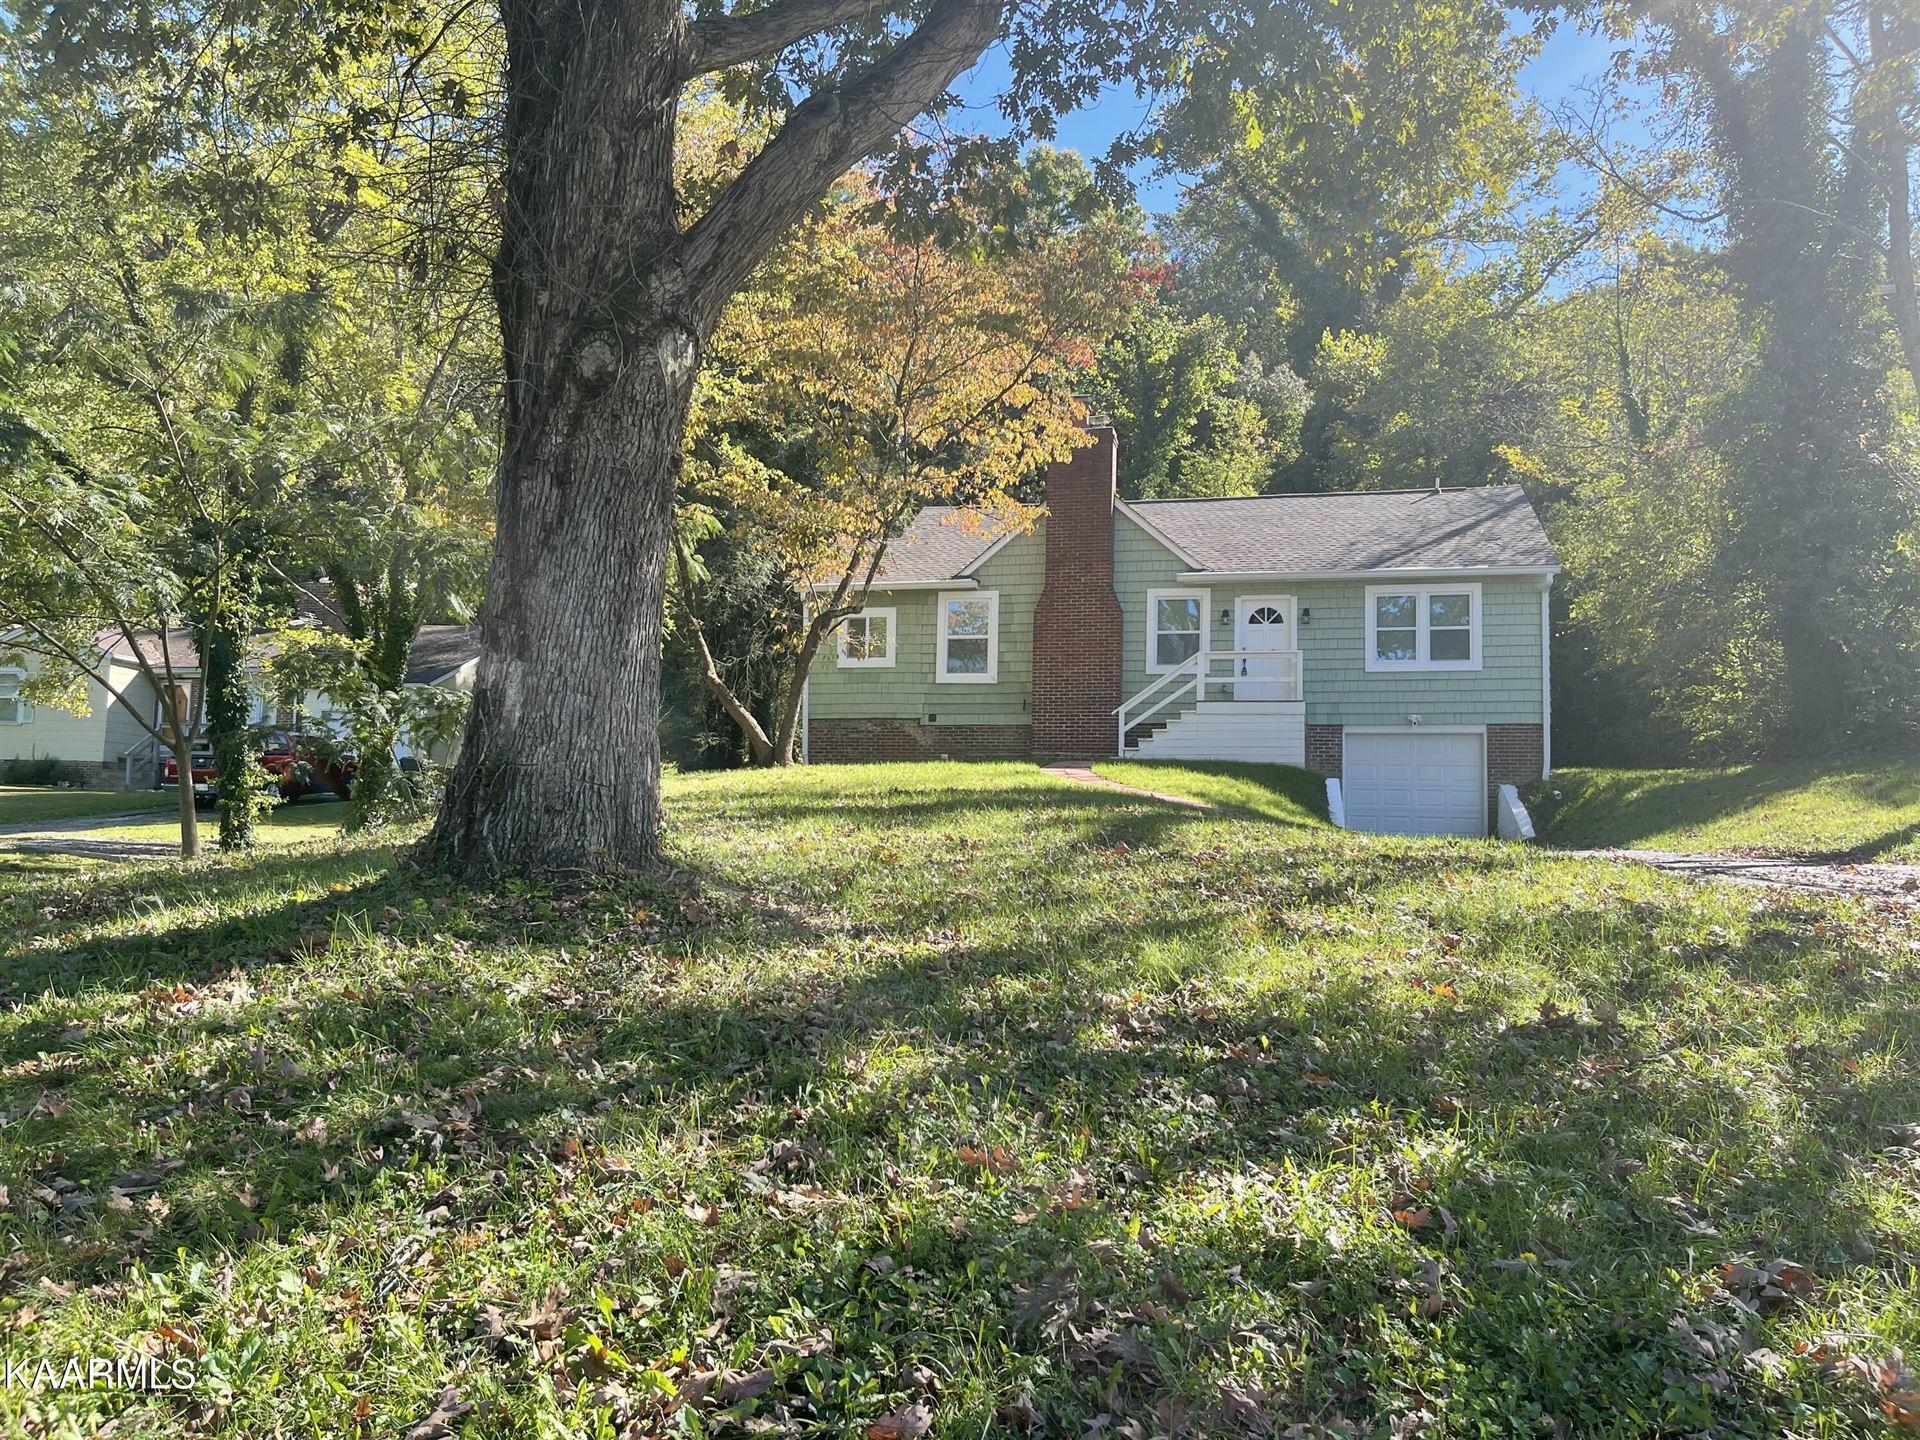 Photo of 4728 Holston Drive, Knoxville, TN 37914 (MLS # 1170953)